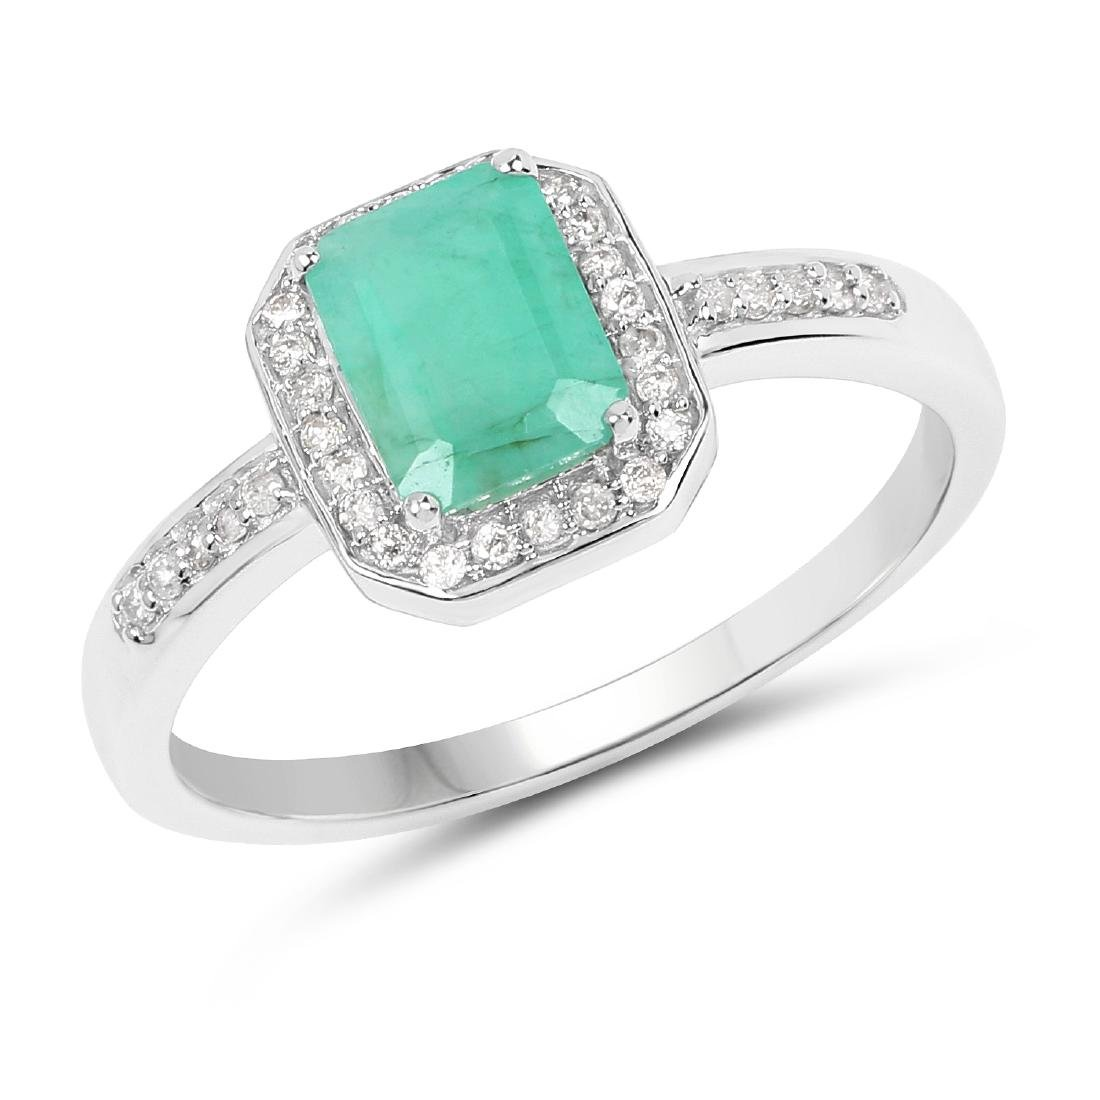 1.08 CTW Emerald & Diamond Ring 10K White Gold